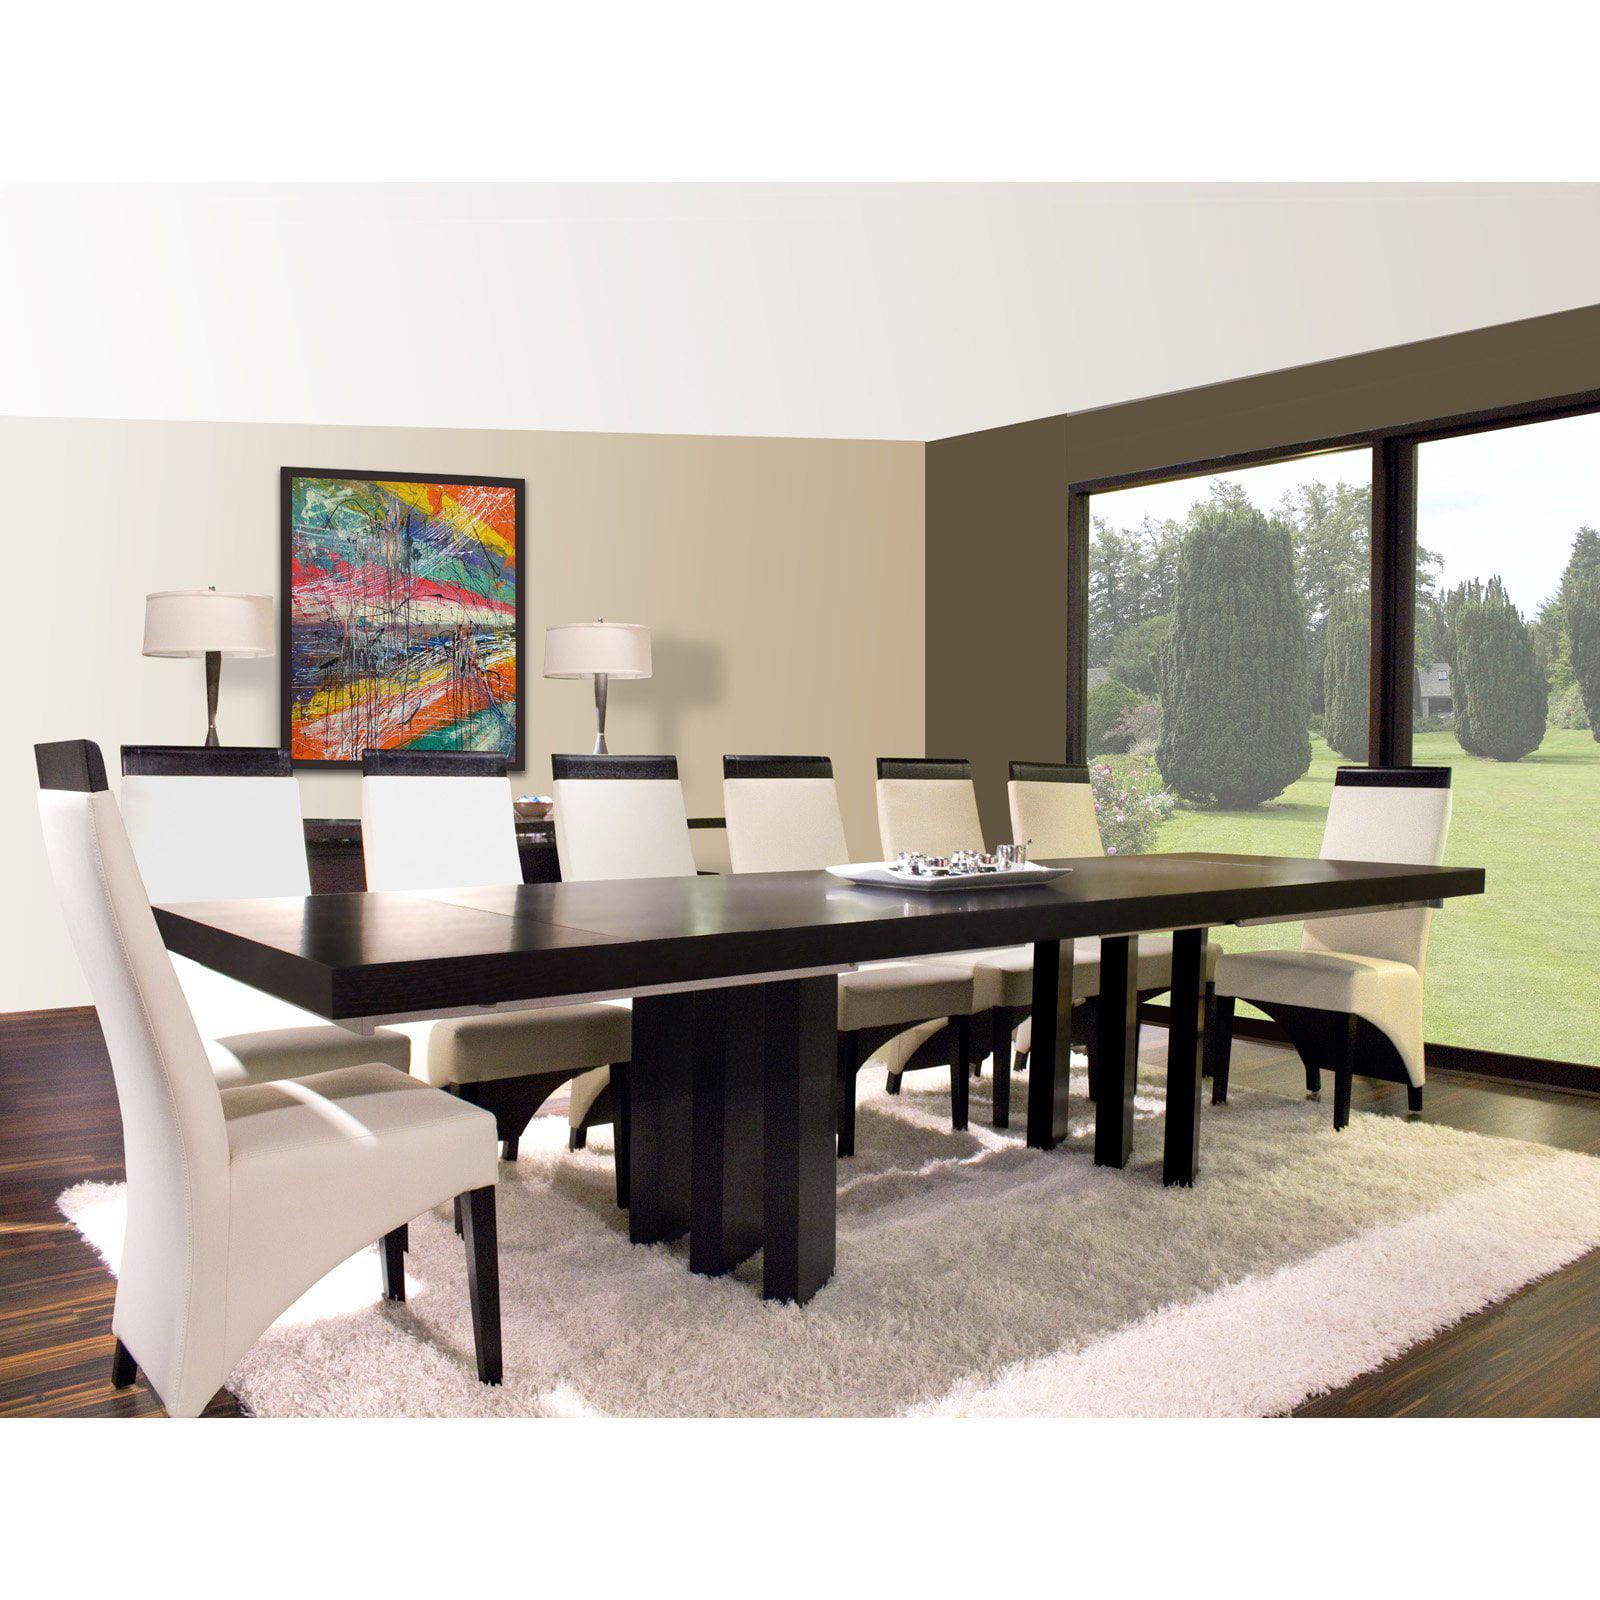 Verona Rectangular Extension Dining Table - Wenge